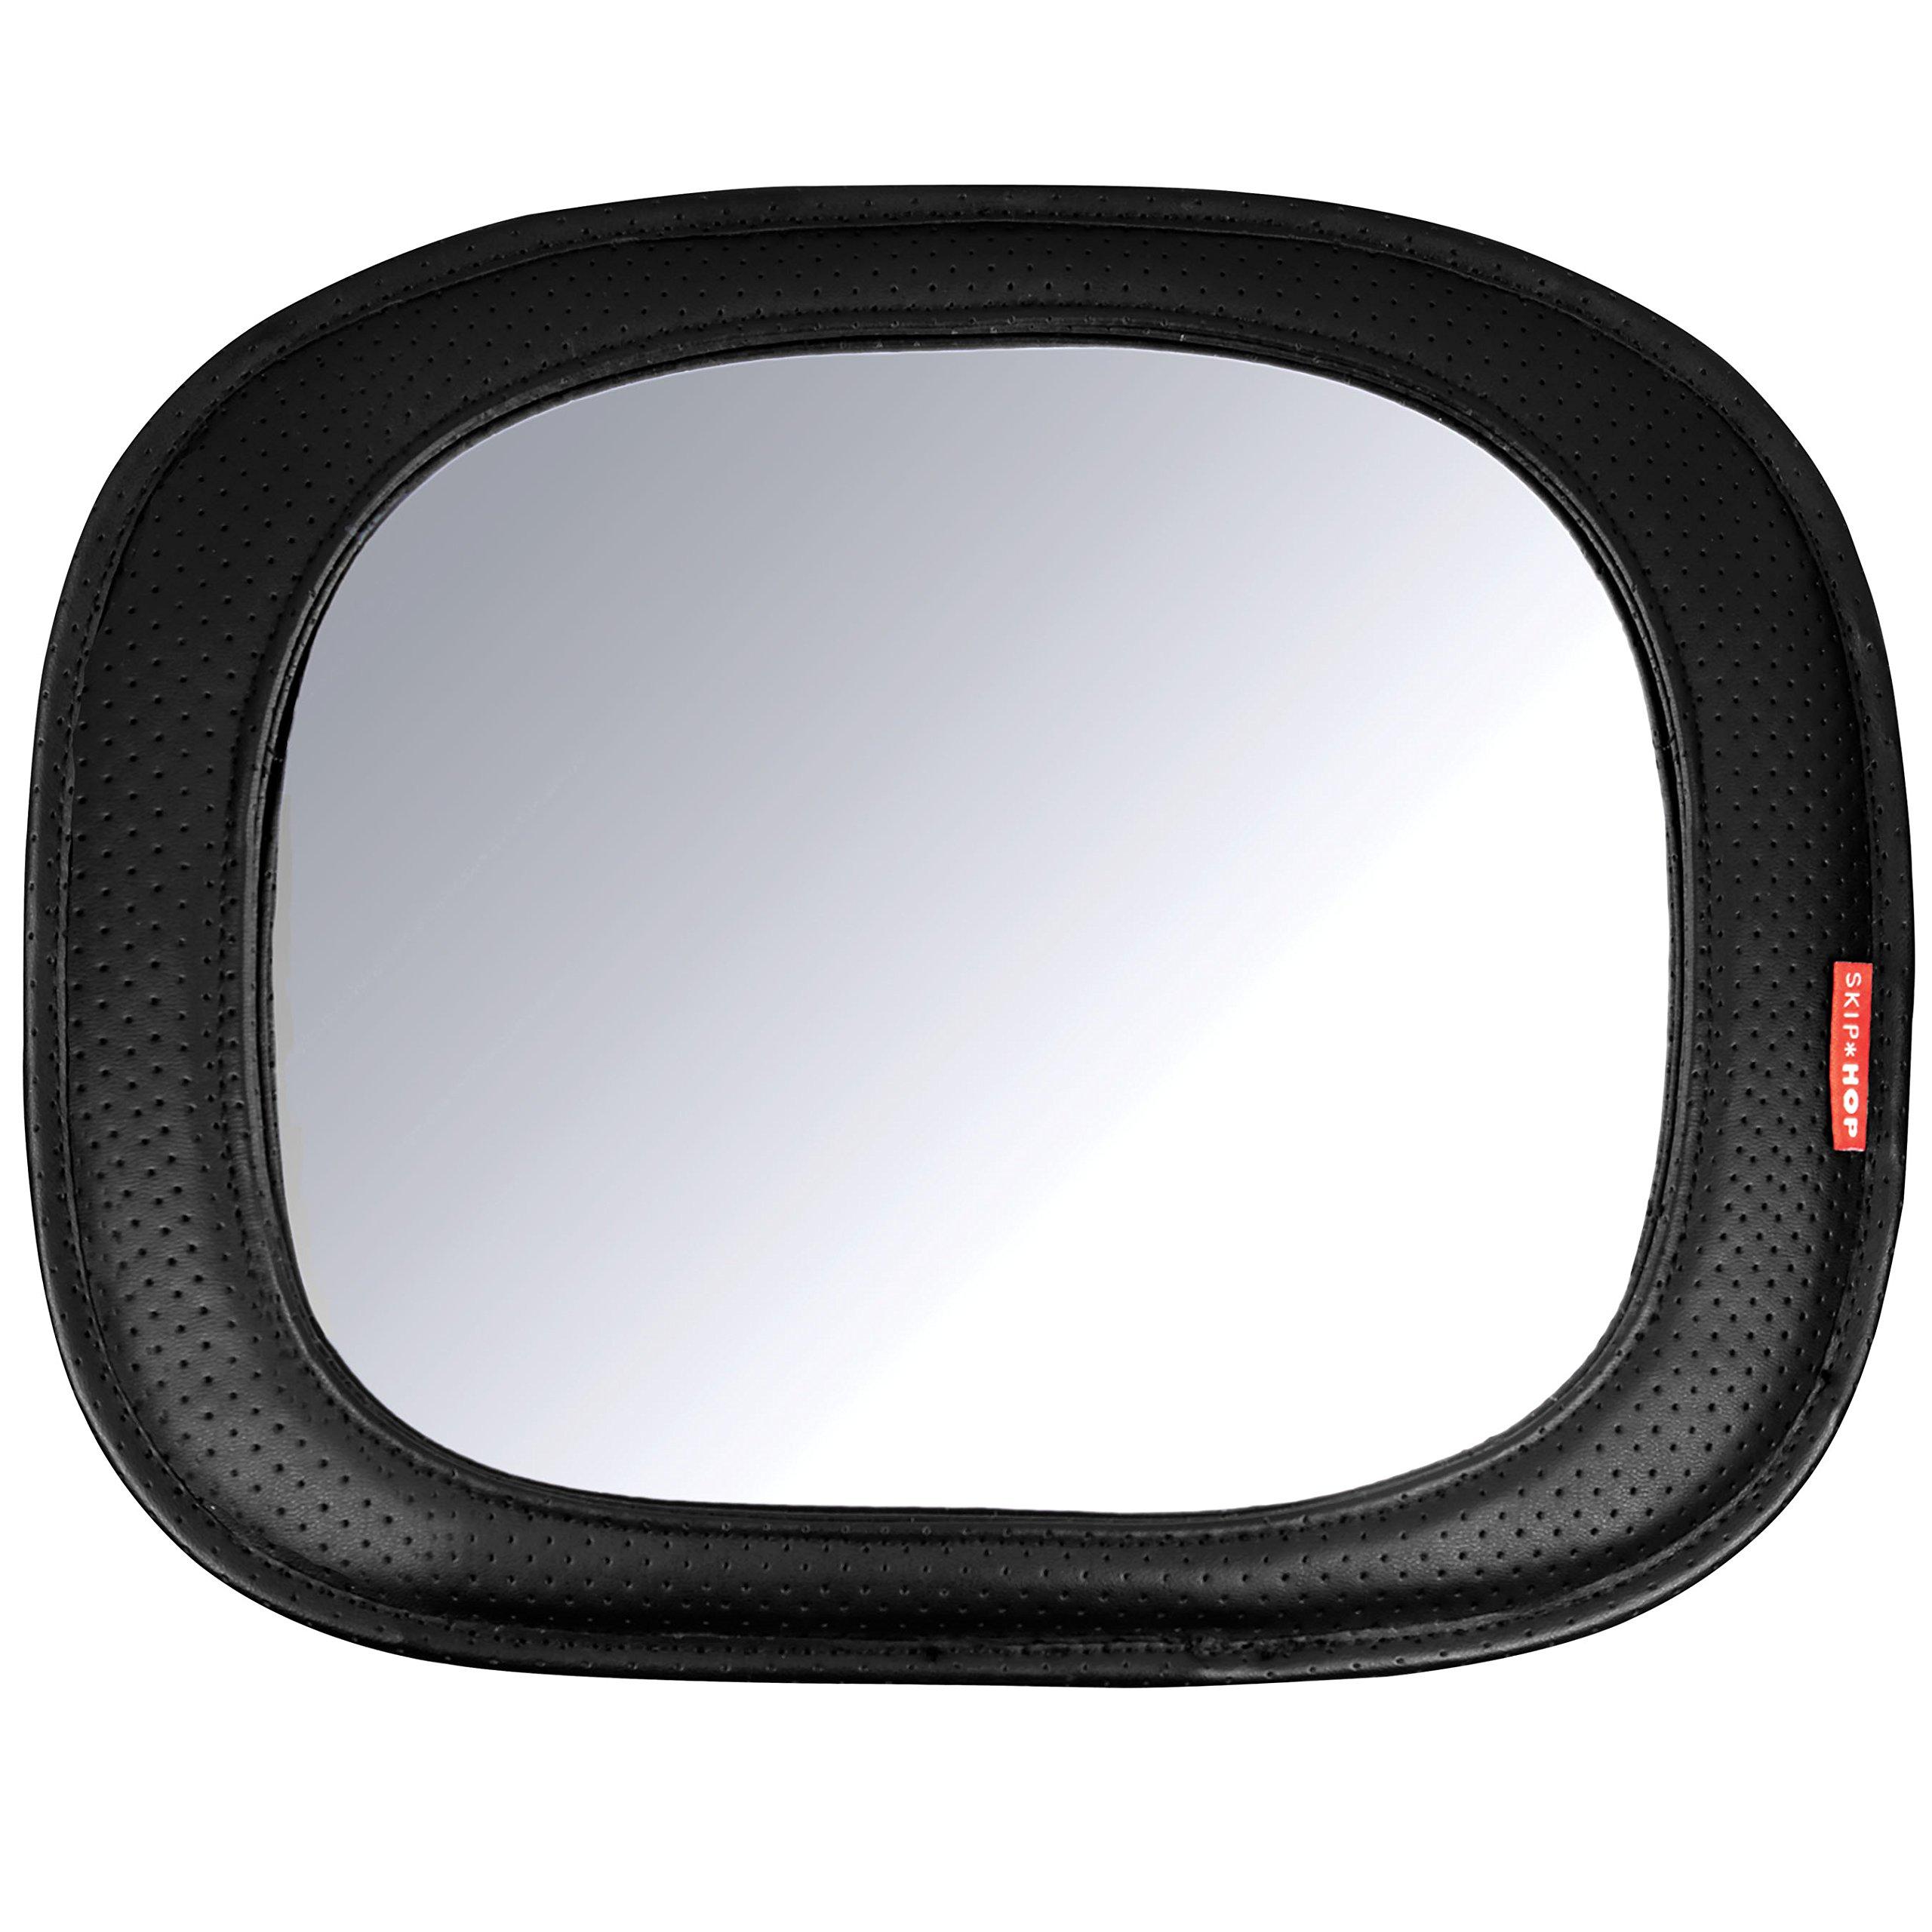 Skip Hop Style Driven Backseat Baby Car Mirror, Black by Skip Hop